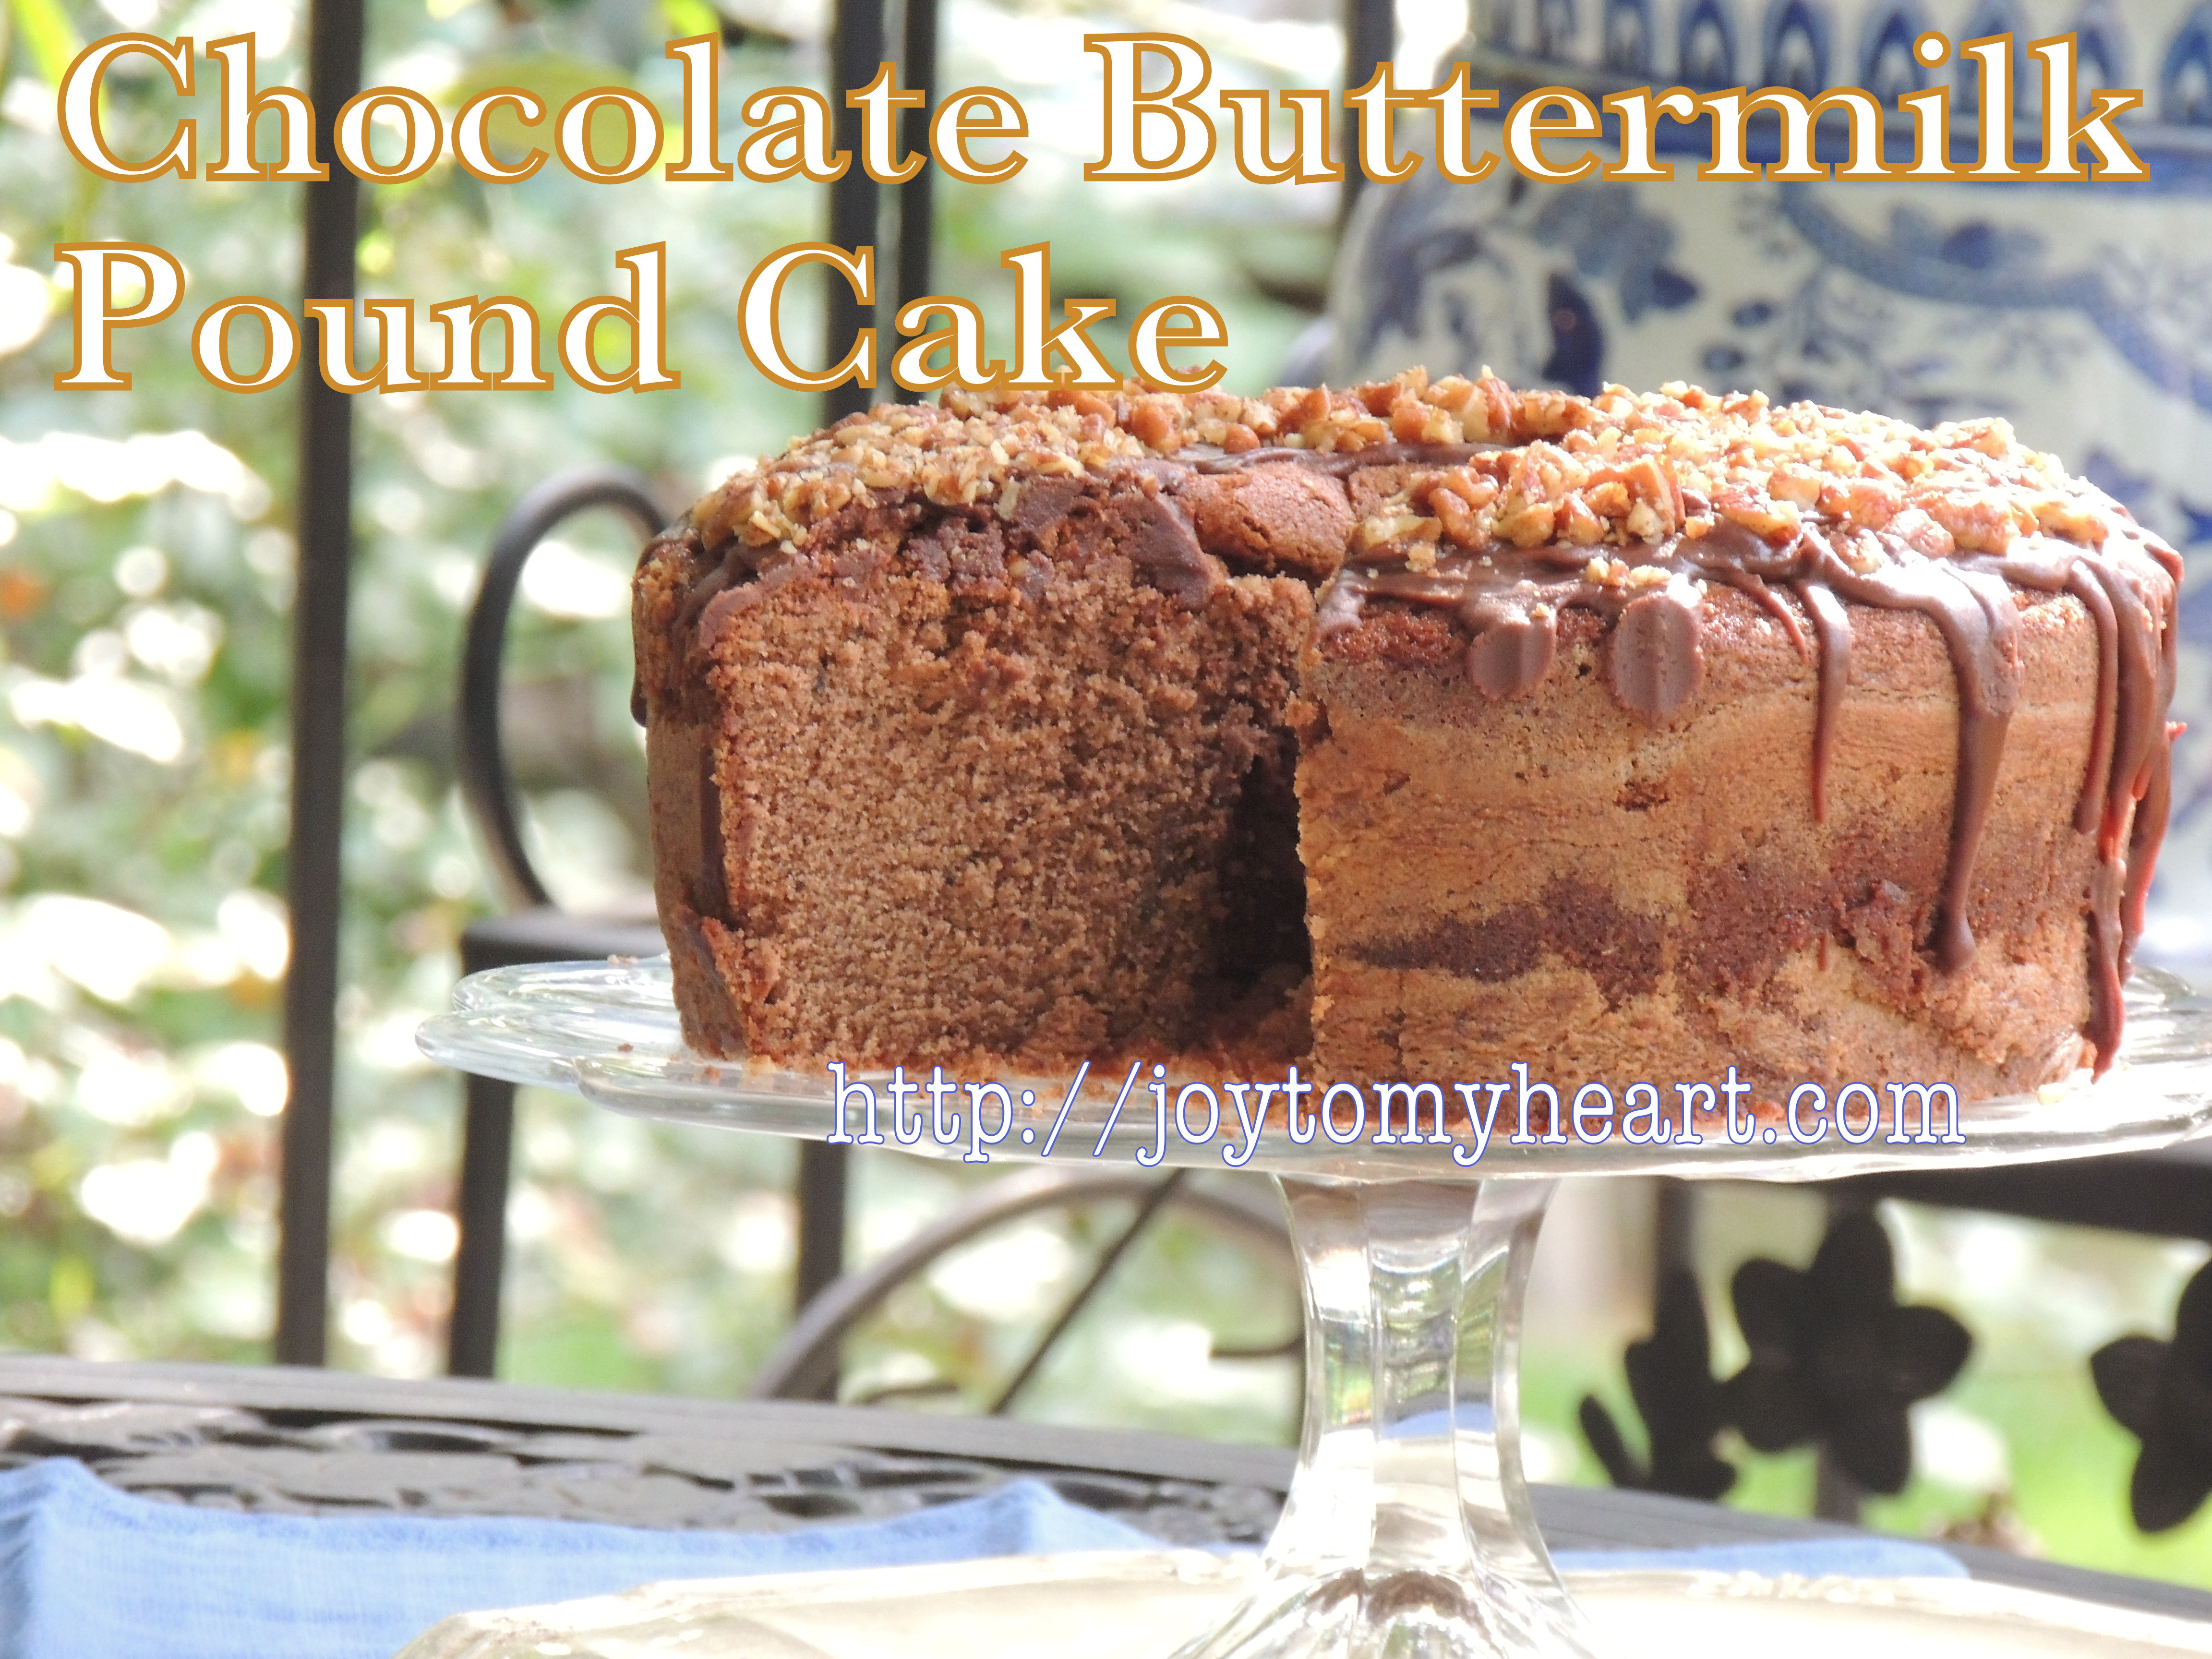 Chocolate Buttermilk Pound Cake